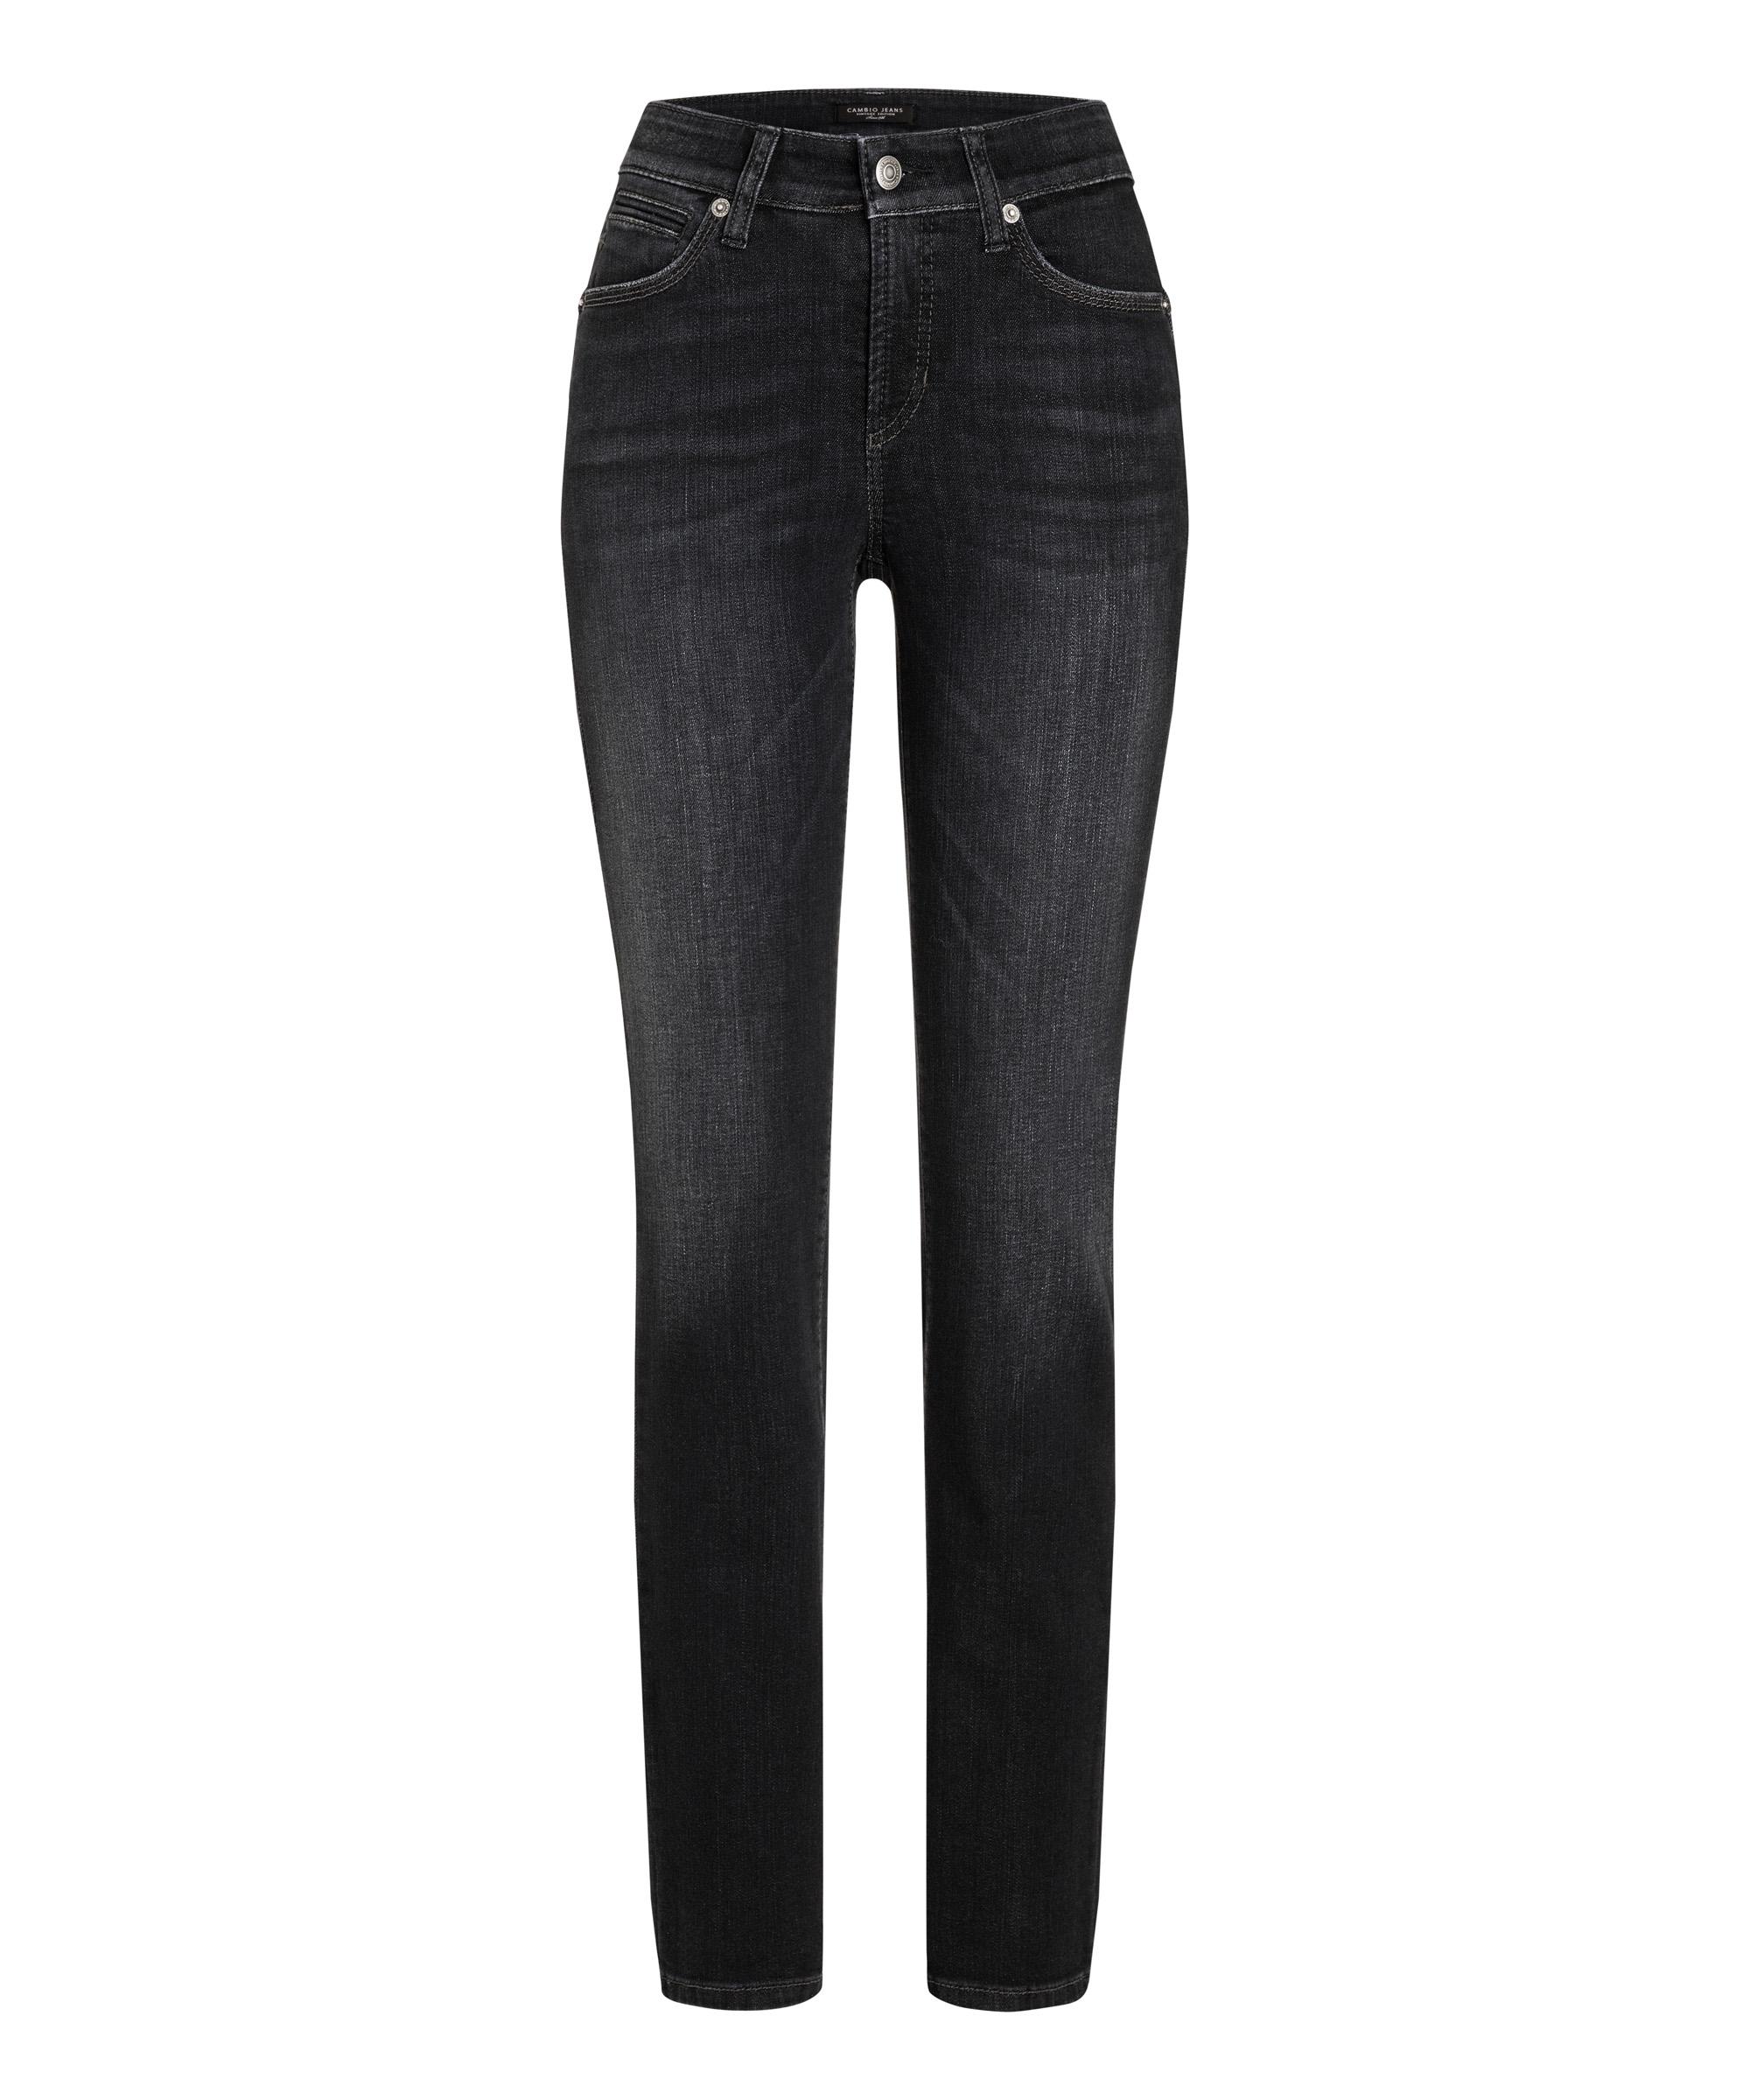 Cambio Jeans Piper seam MEDIUM USED